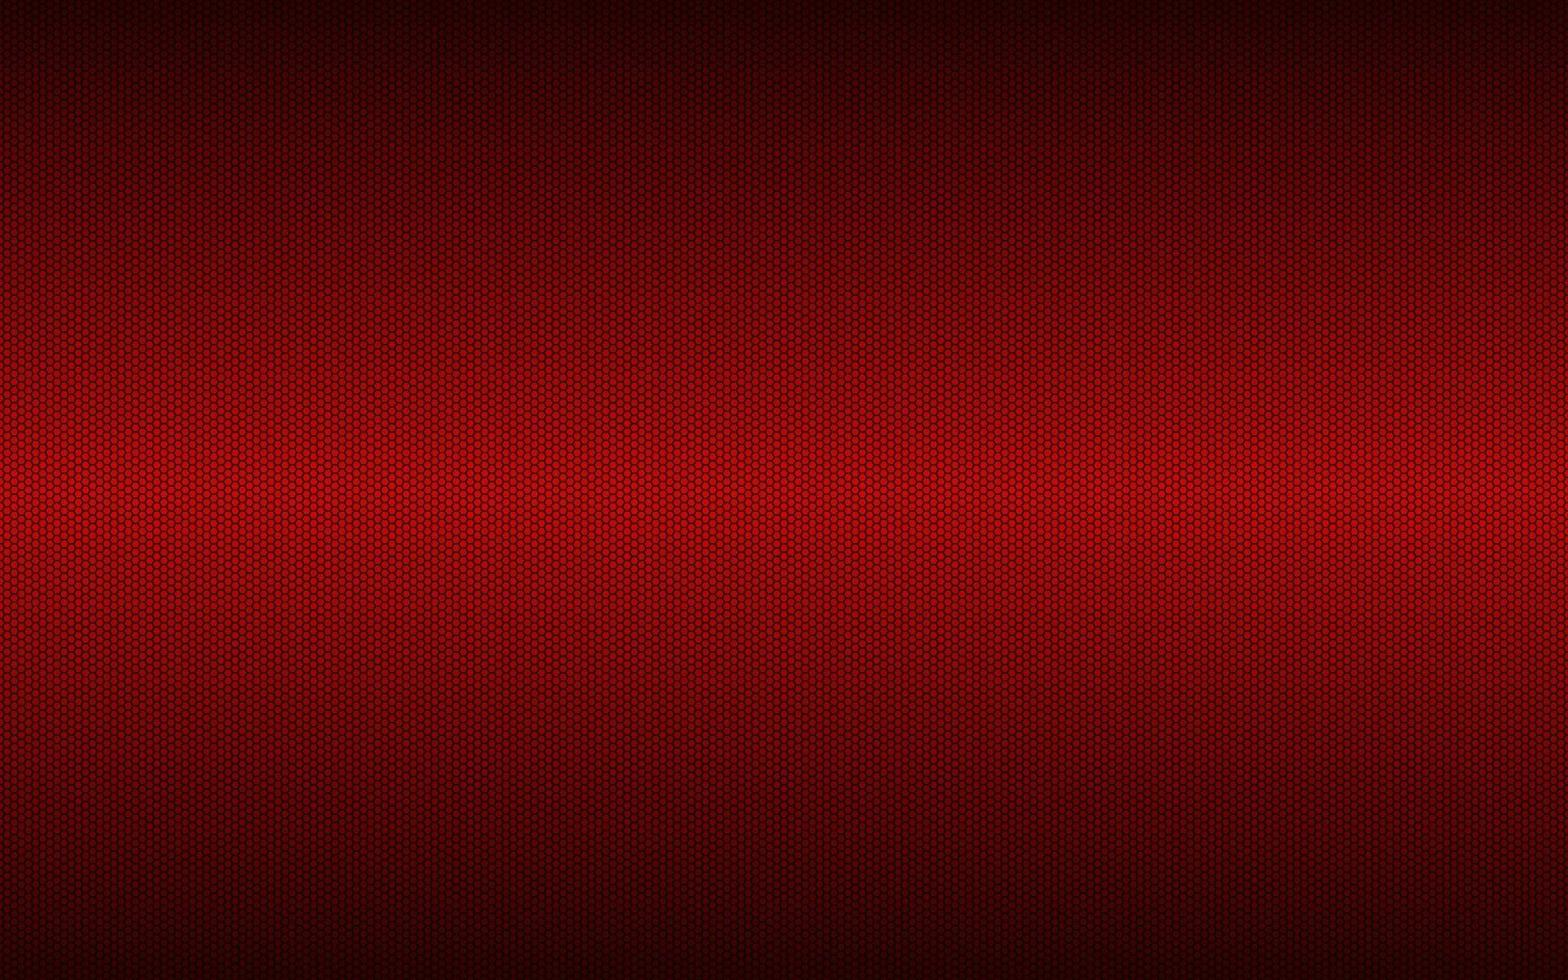 Fondo geométrico rojo moderno de alta resolución con rejilla poligonal. patrón hexagonal metálico oscuro abstracto. ilustración vectorial simple vector